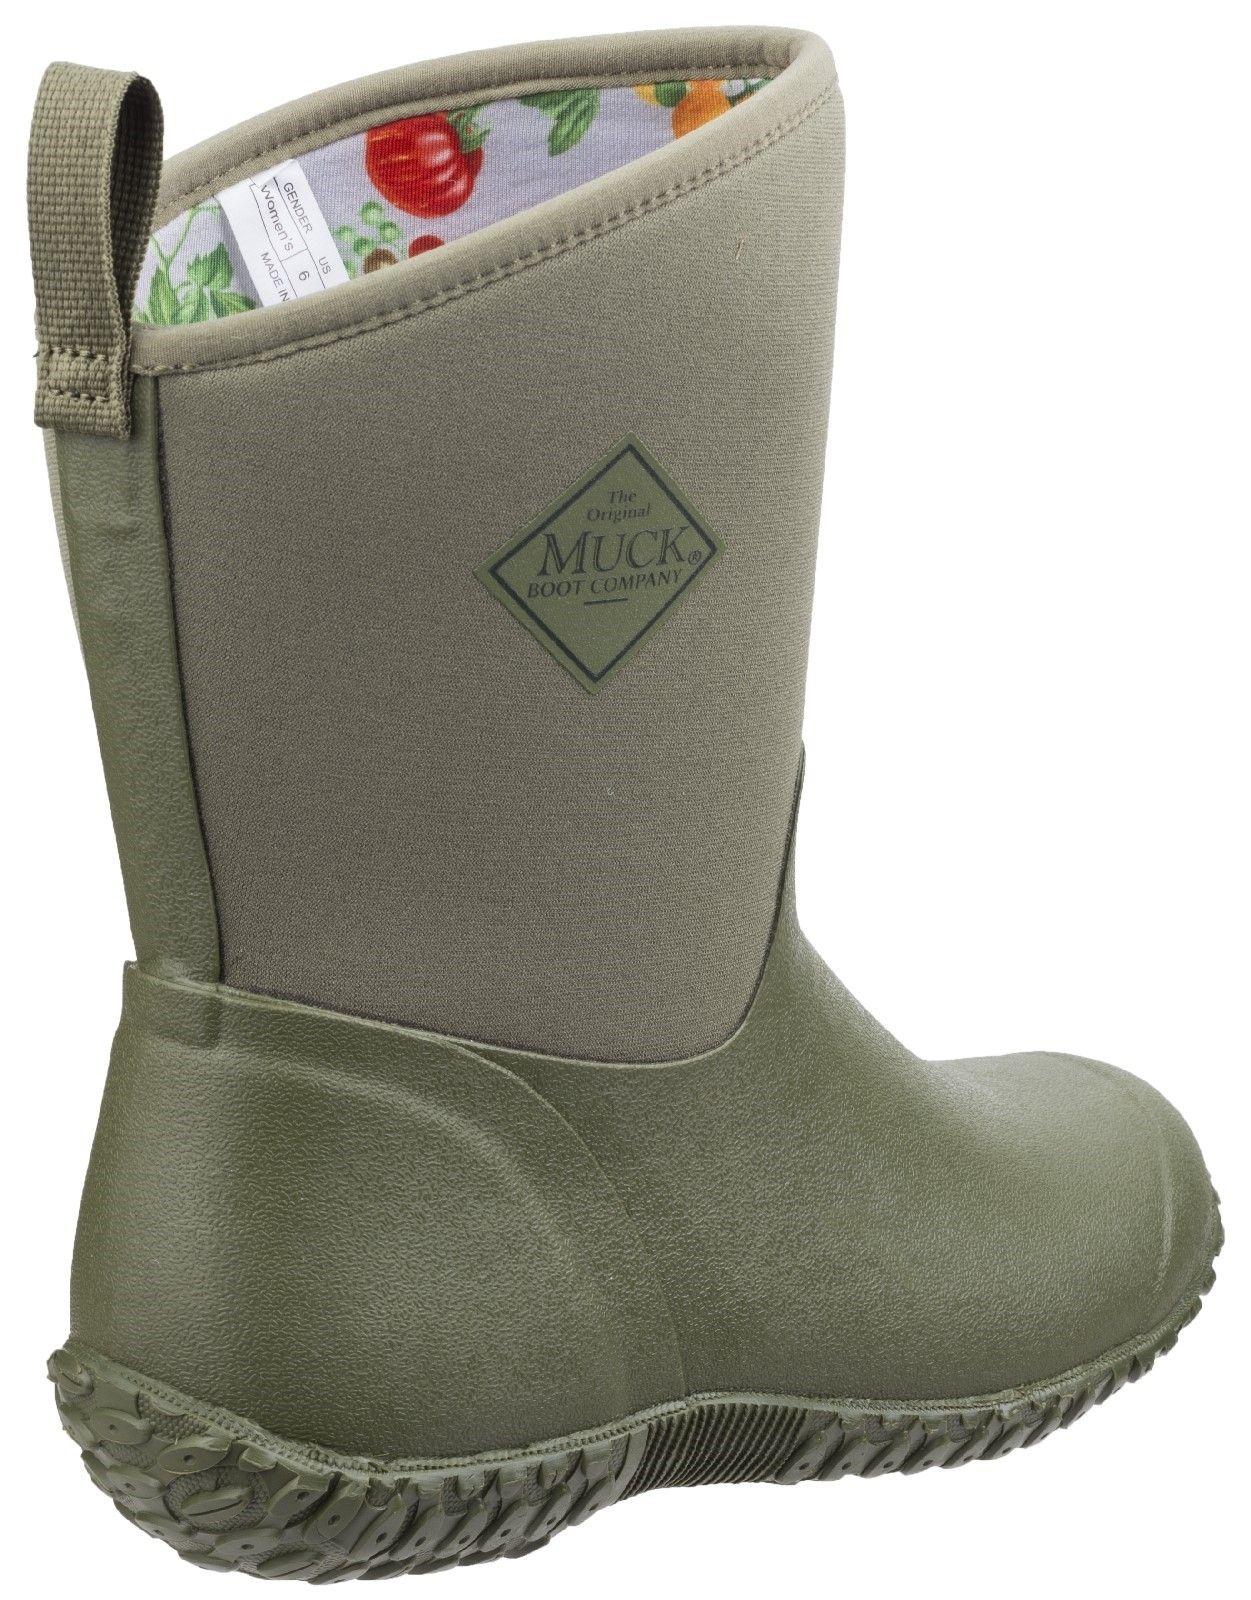 Muckster II Mid RHS Print Gardening Shoe